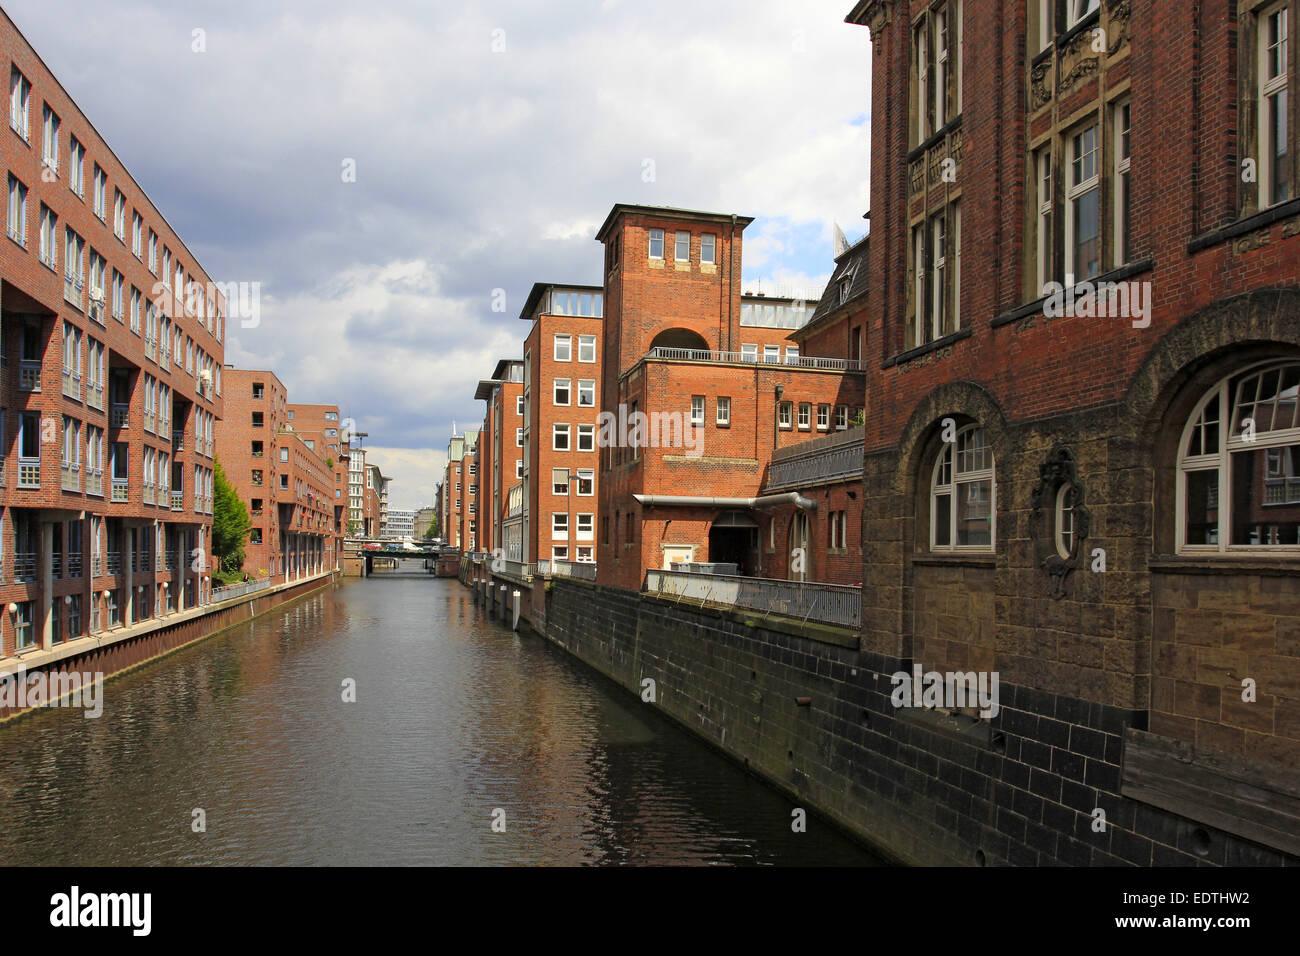 Deutschland, Hansestadt Hamburg, Backsteingebäude am Herrengrabenfleet,Germany, Hanseatic City Hamburg, Brick - Stock Image